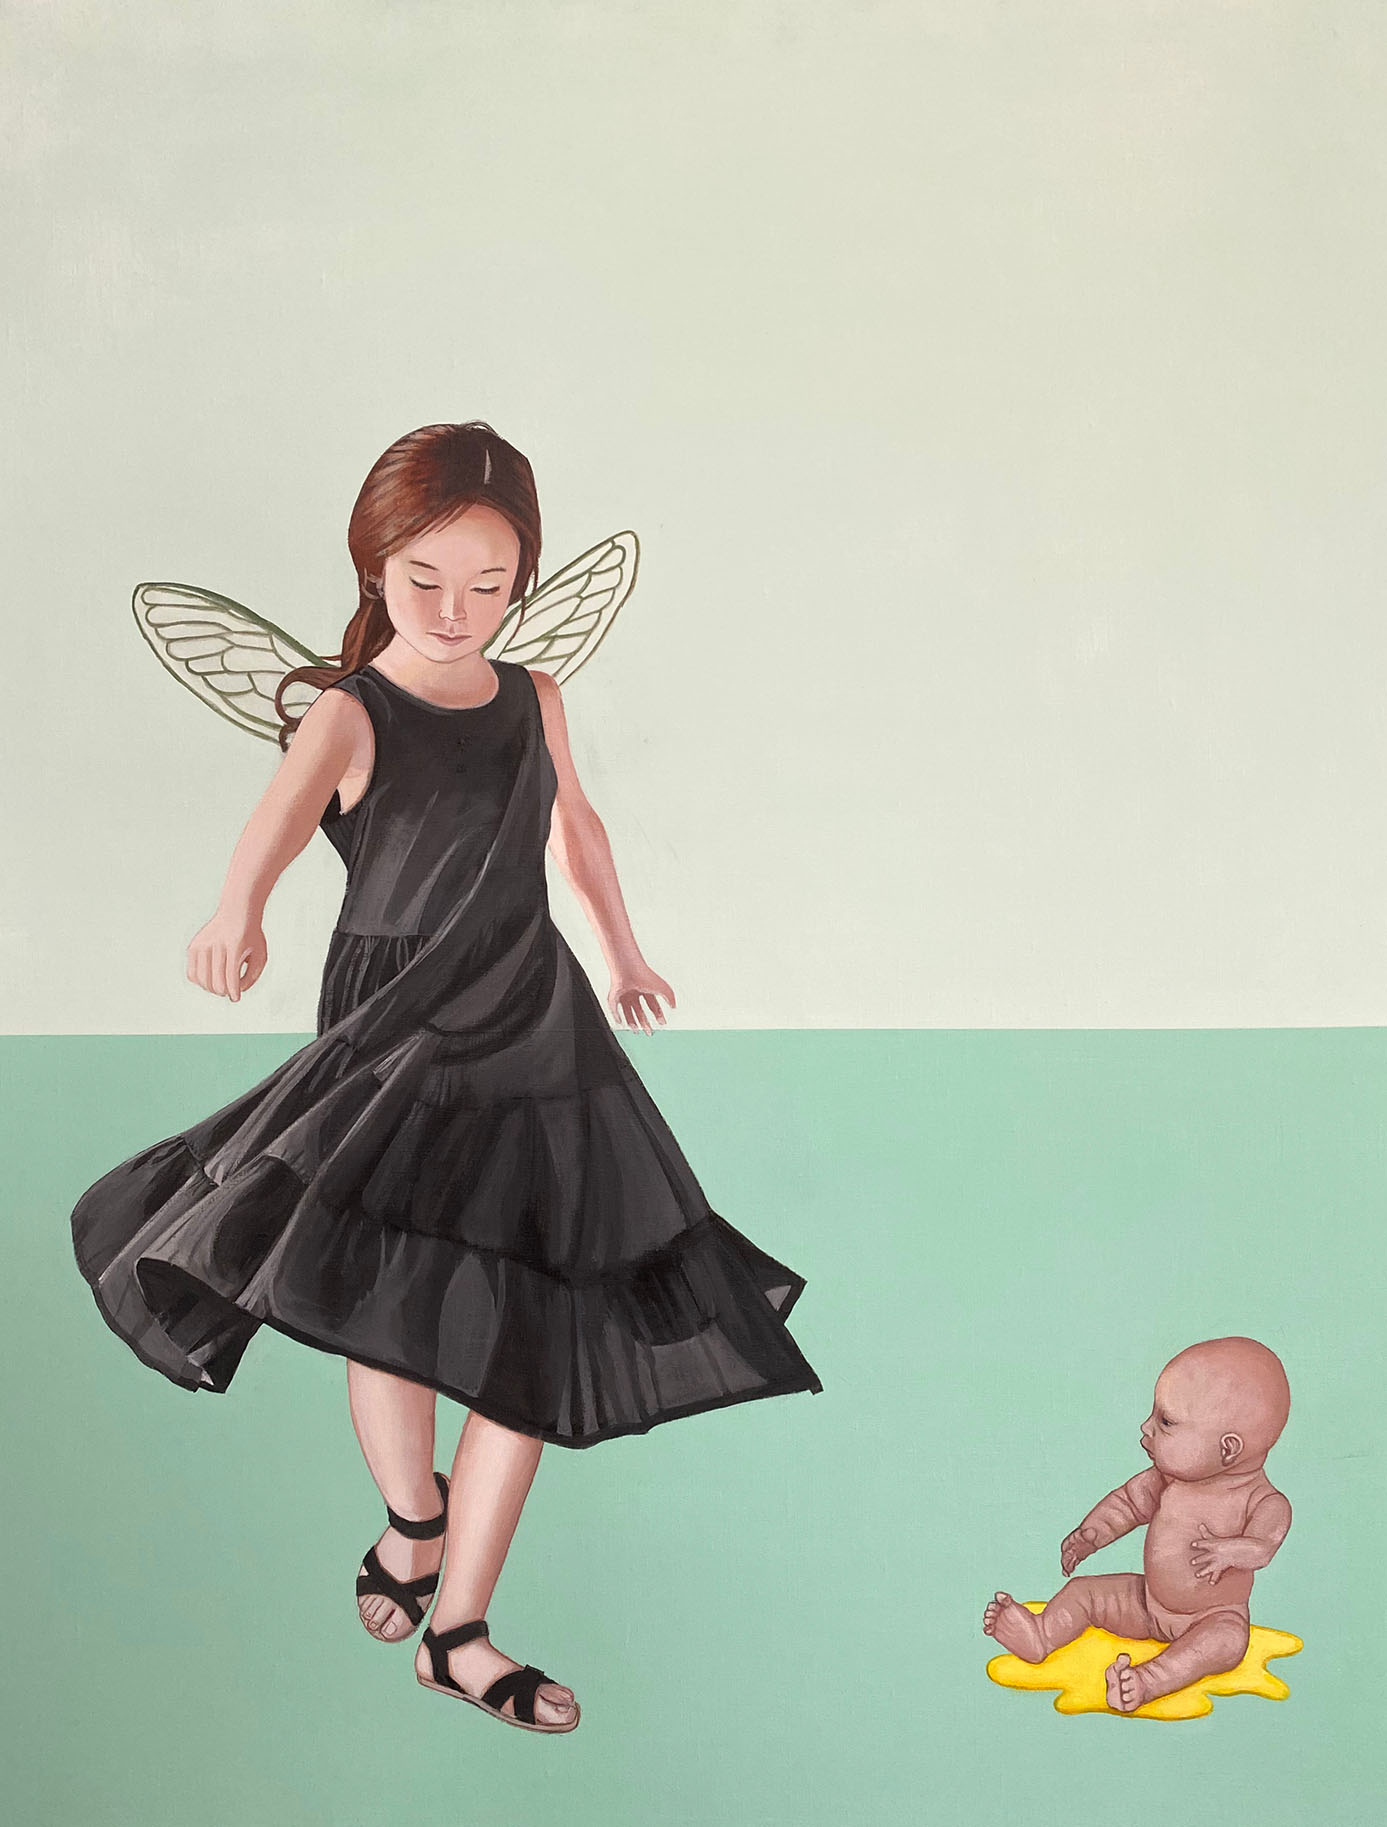 Cristina Ruiz Guinazu, La danse, acrylics on canvas, 92 x 73 cm, 2017